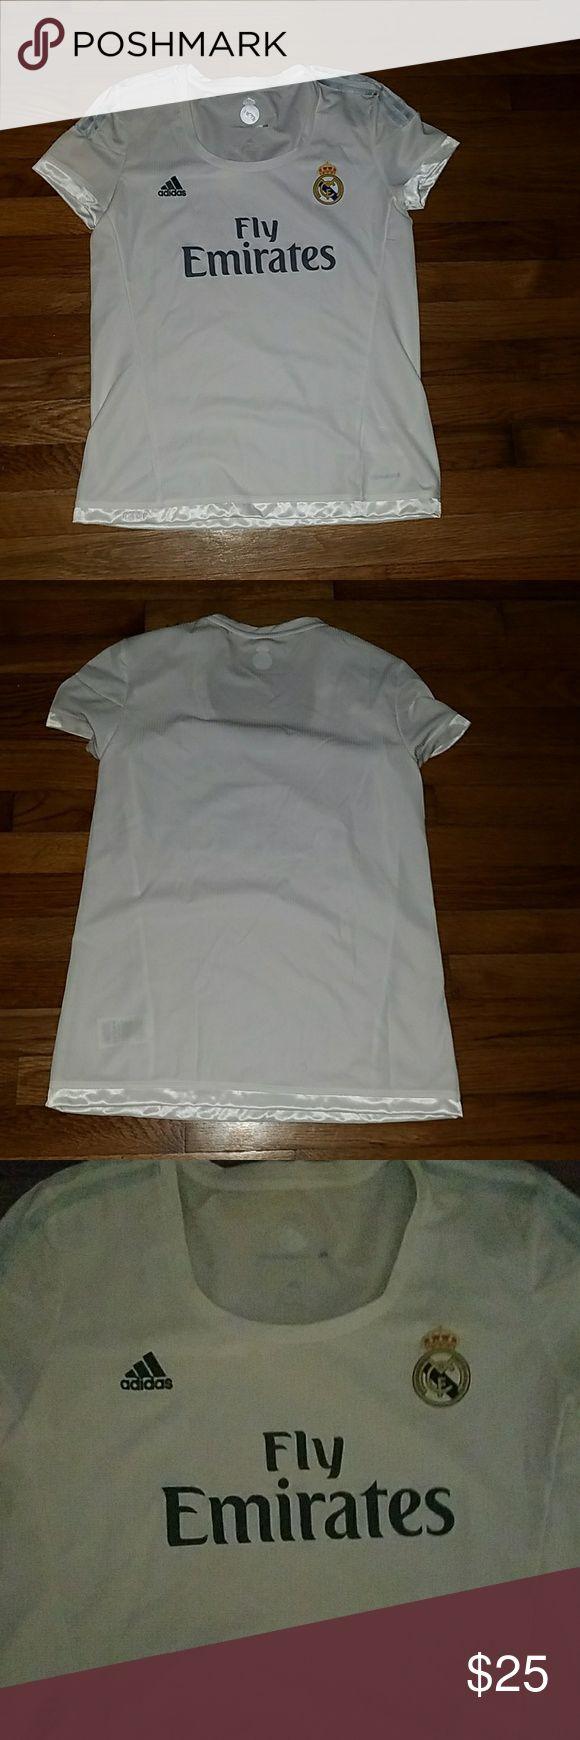 Real Madrid Adidas T-Shirt Women's Real Madrid Adidas T-Shirt Women's  Soccer League 2015-2016 Size L Good Condition adidas Tops Tees - Short Sleeve